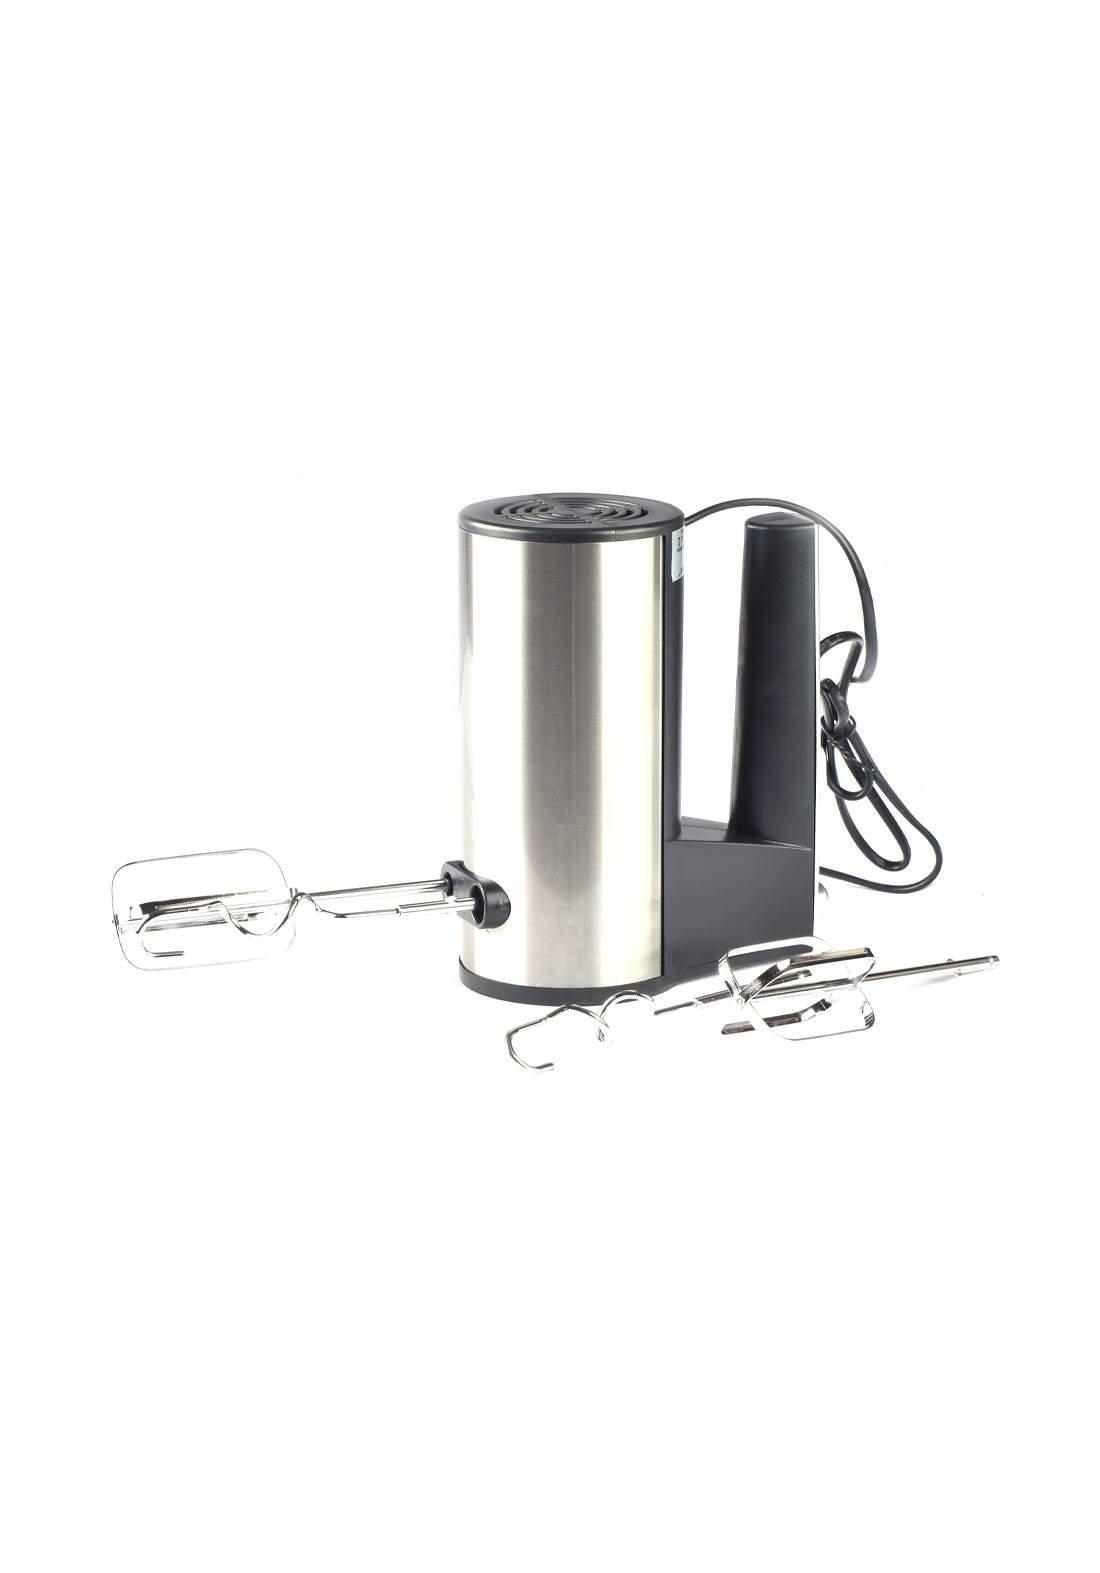 Sokany CX-6619 Electric Hand Mixer 300W خلاط يدوي